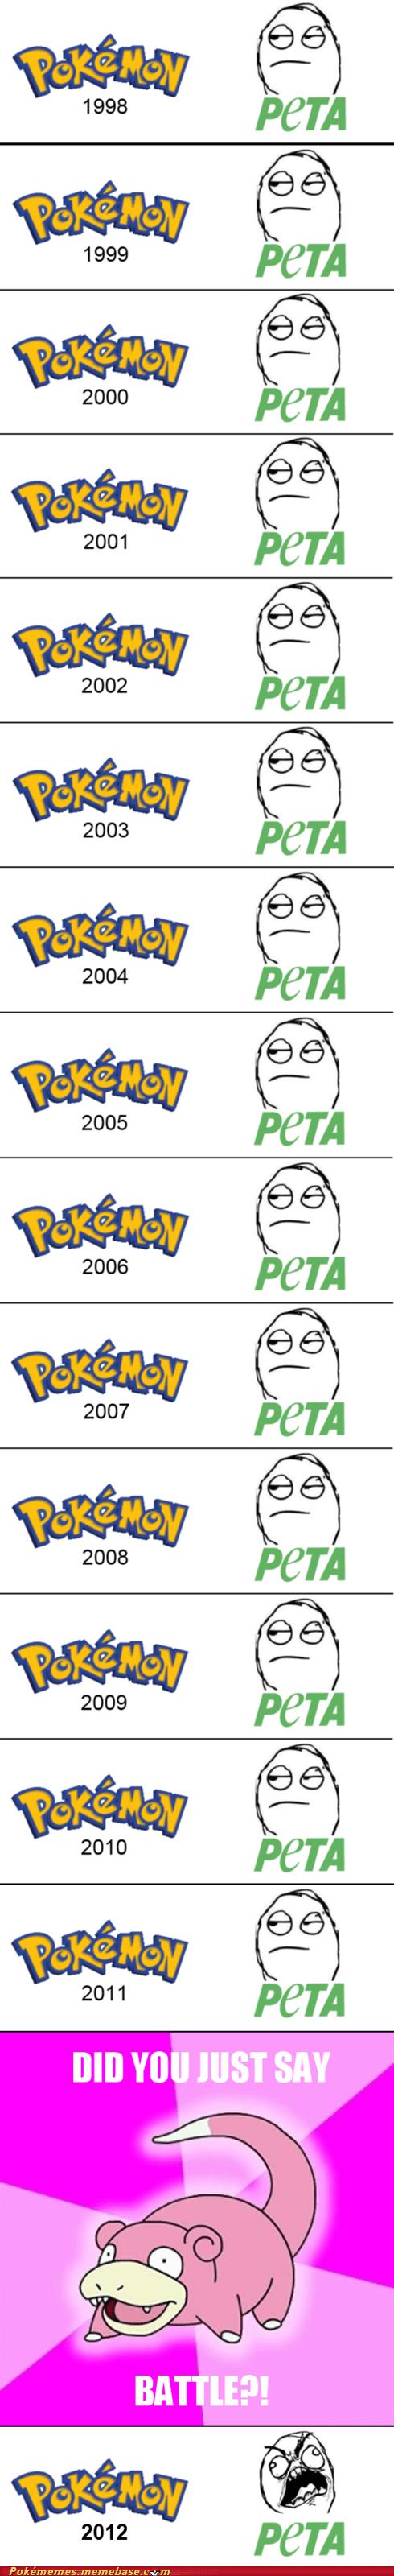 peta slowpoke all these years Pokémon - 6664958464